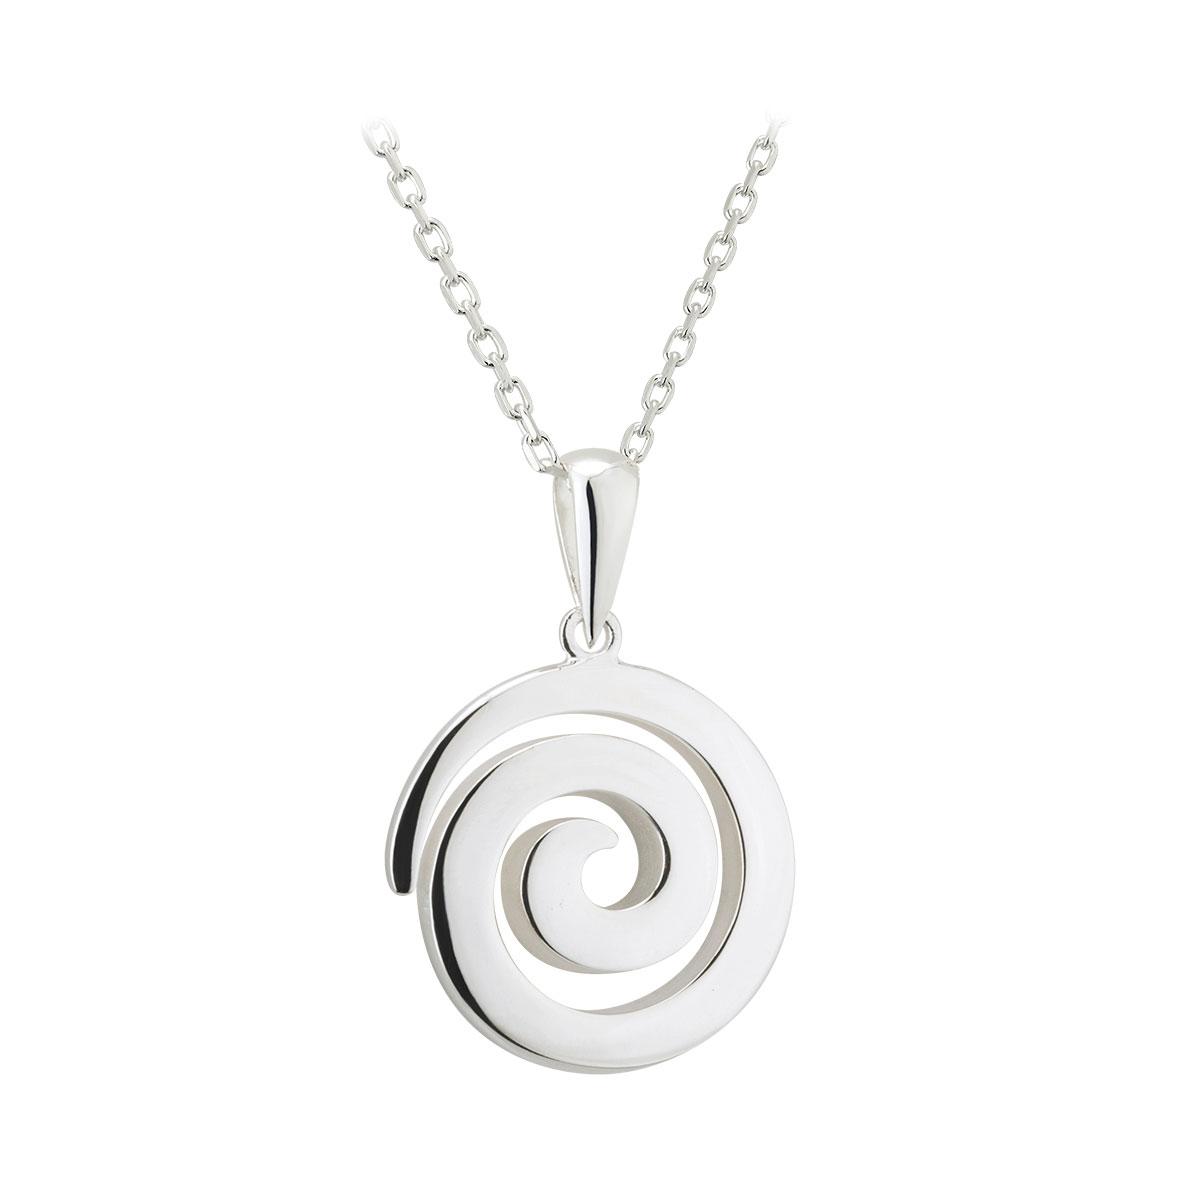 Cashs Ireland, Sterling Silver Celtic Spiral Pendant